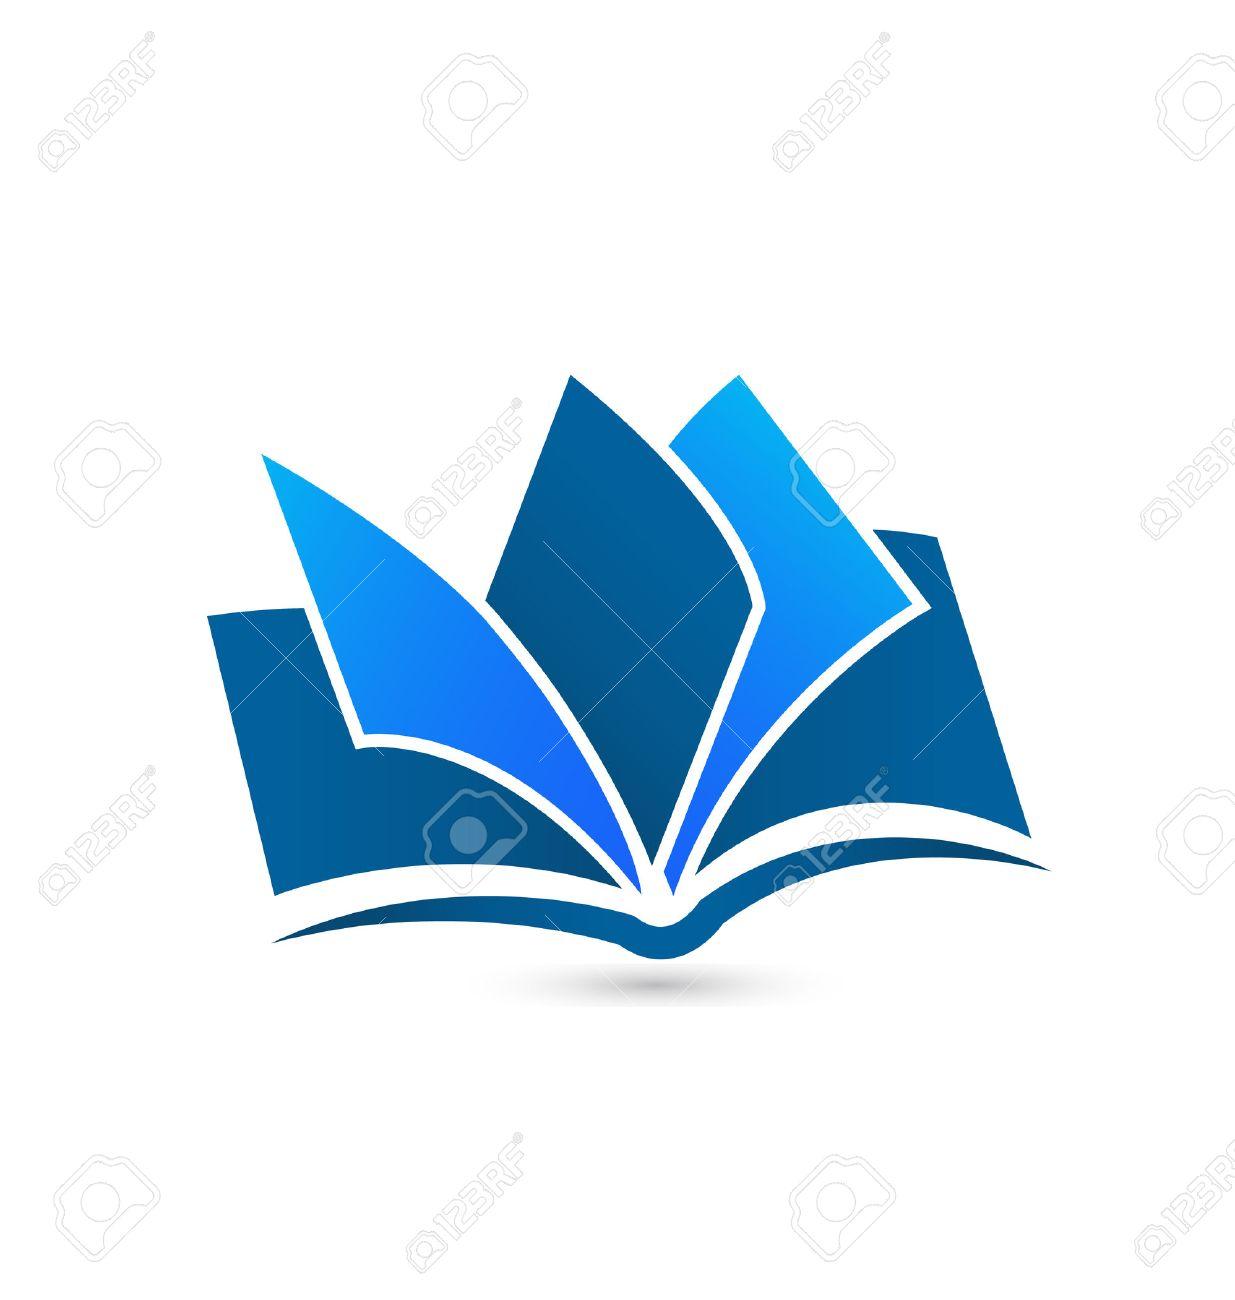 Book illustration blue icon design vector background template - 34198185